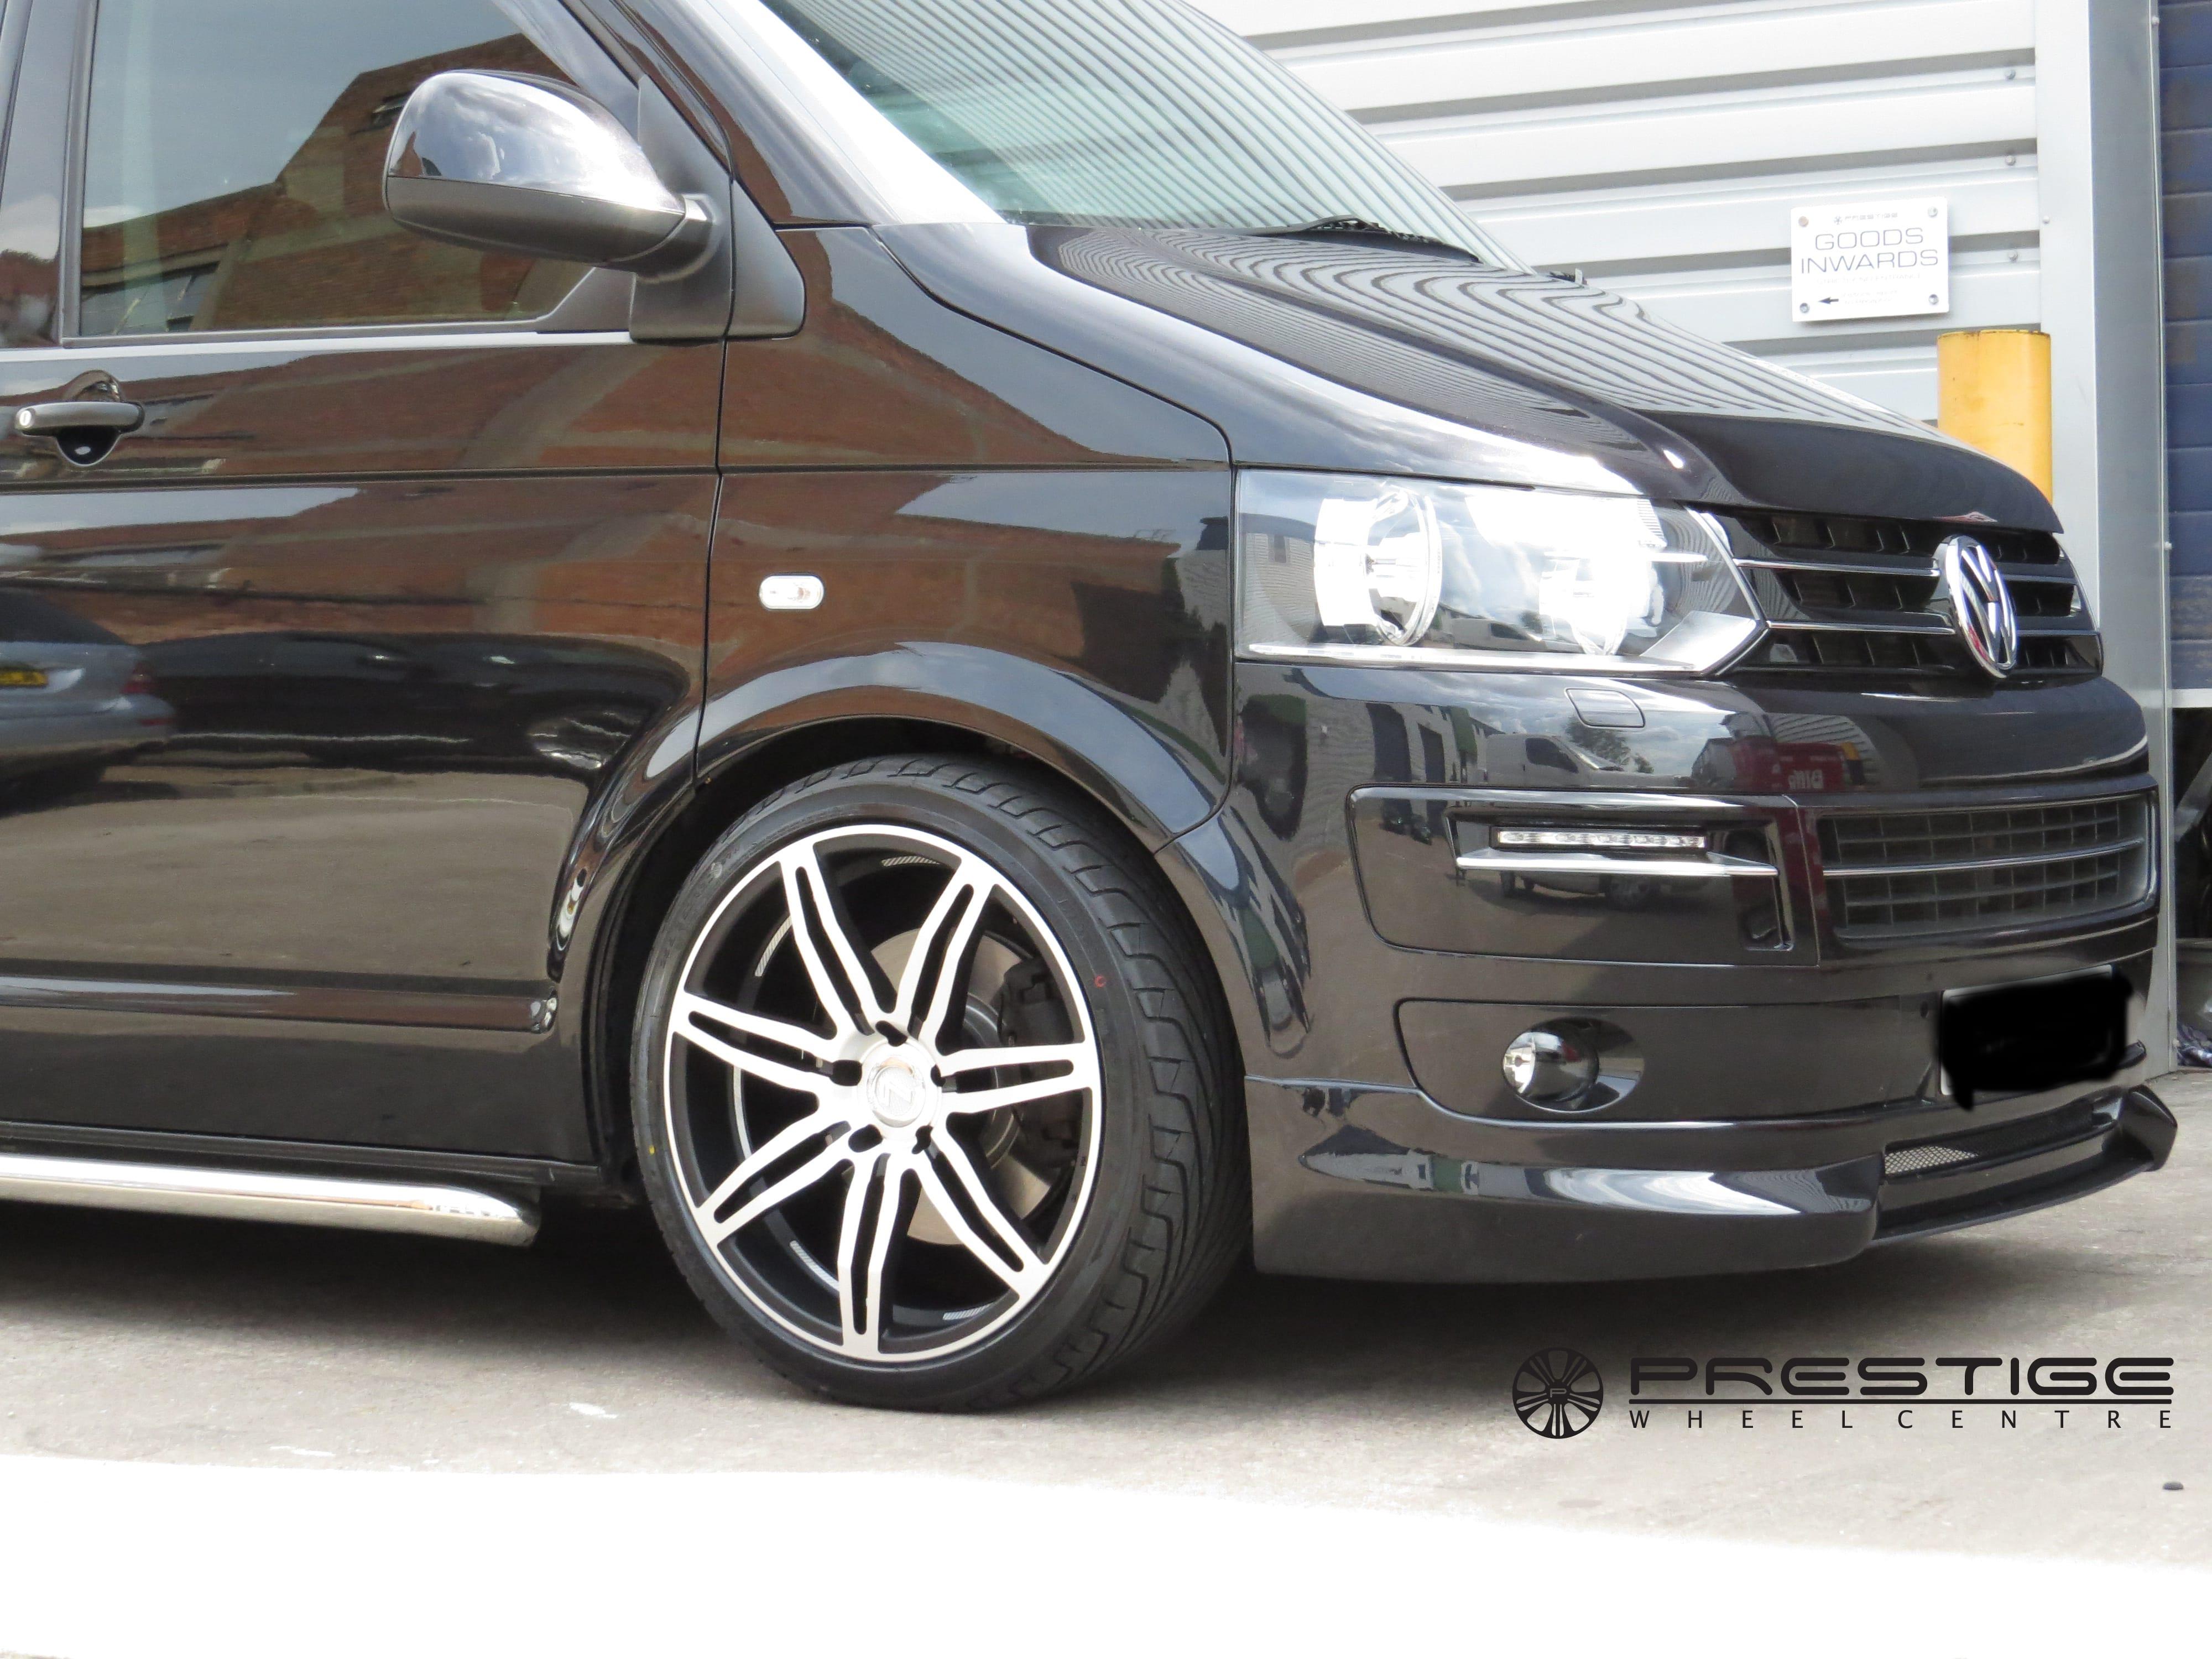 Vw Transporter T5 Alloy Wheels Lenso Cq2 20 Quot Prestige